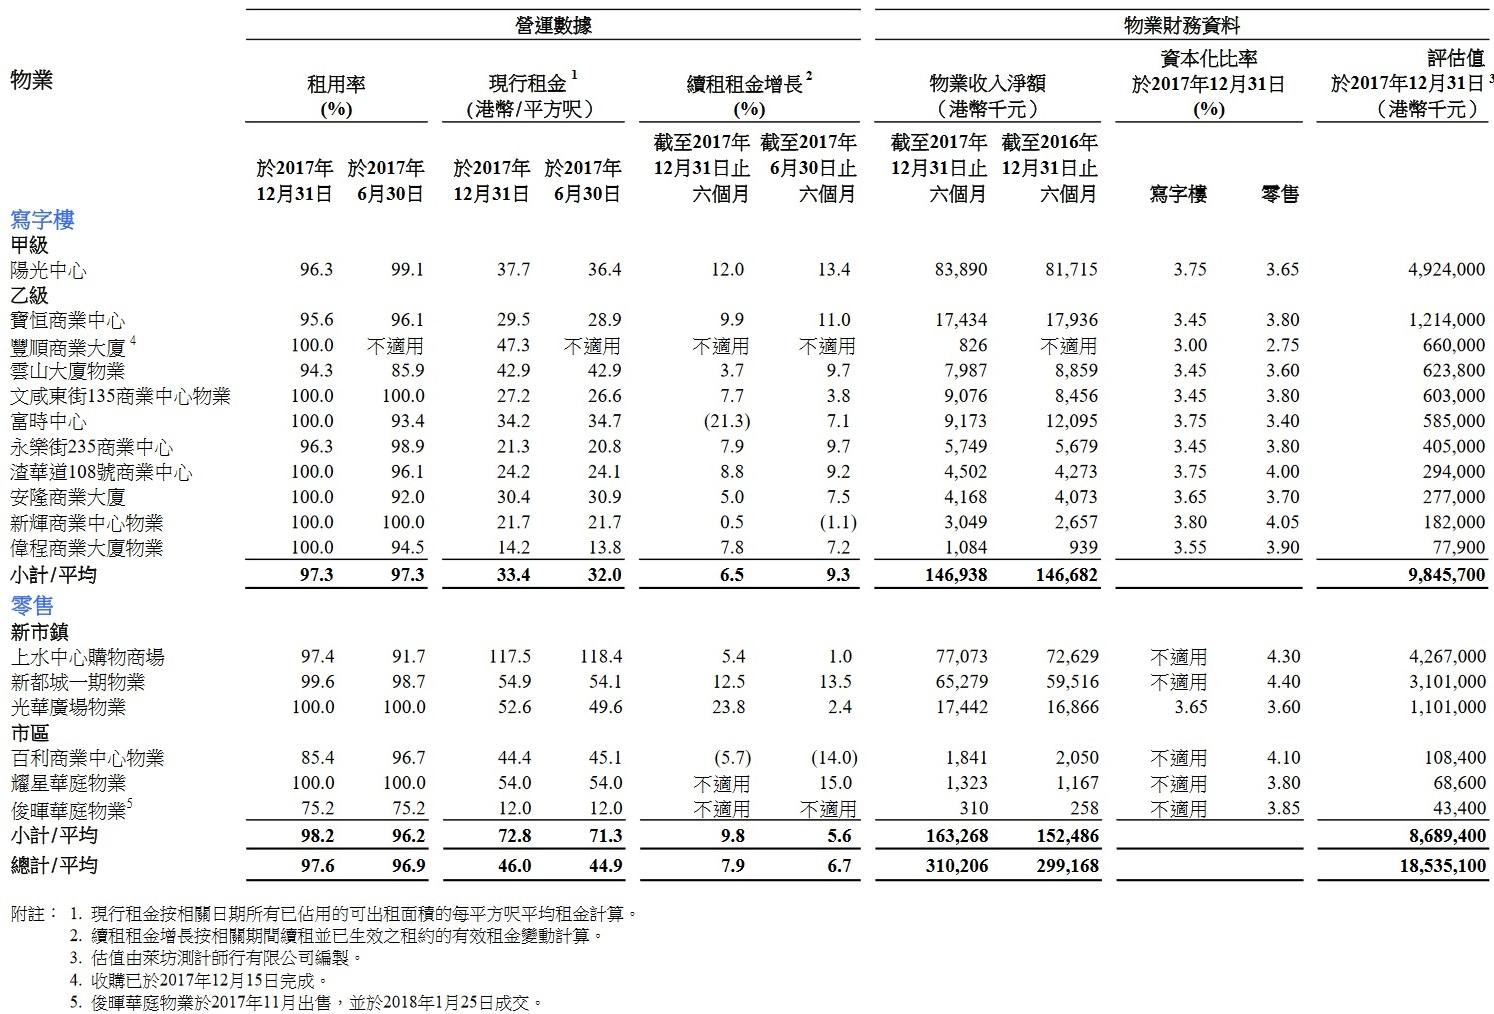 Forest Capital 收息股收藏家: 續買62載通 1052越秀交通 435陽光房產末期業績與派息公布